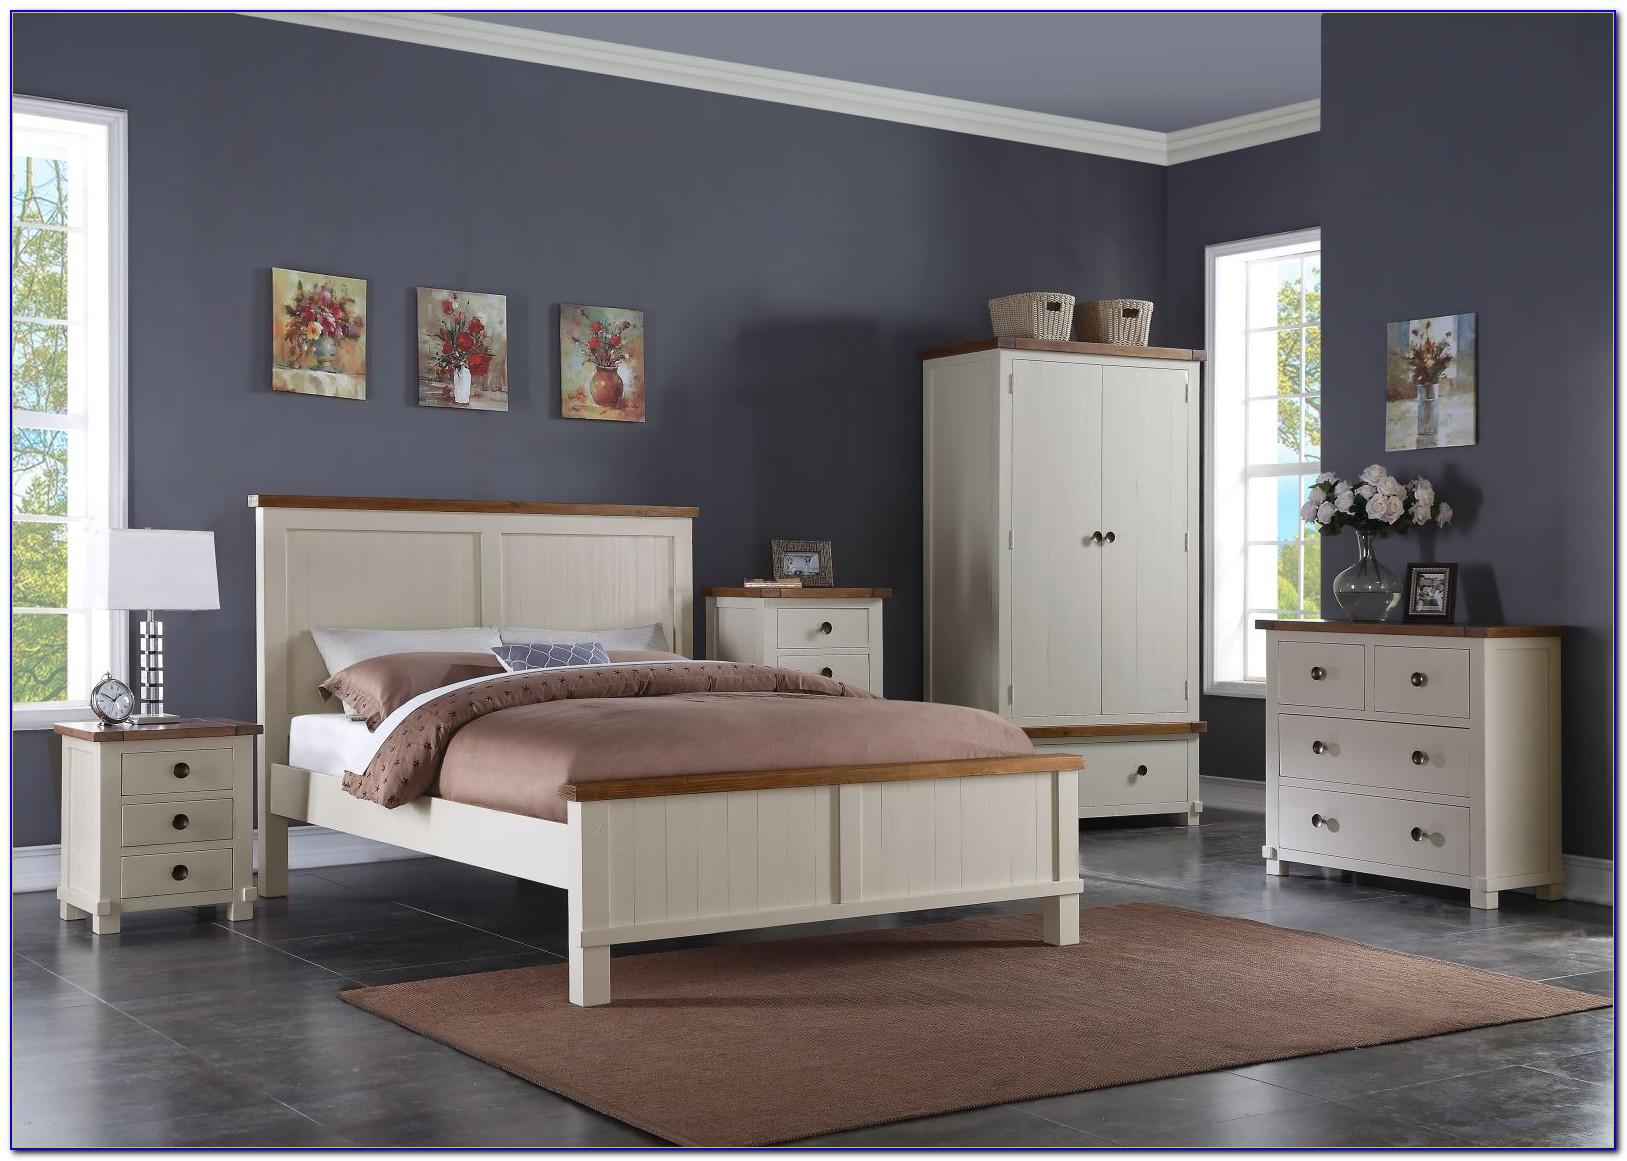 Reclaimed Barn Wood Bedroom Furniture